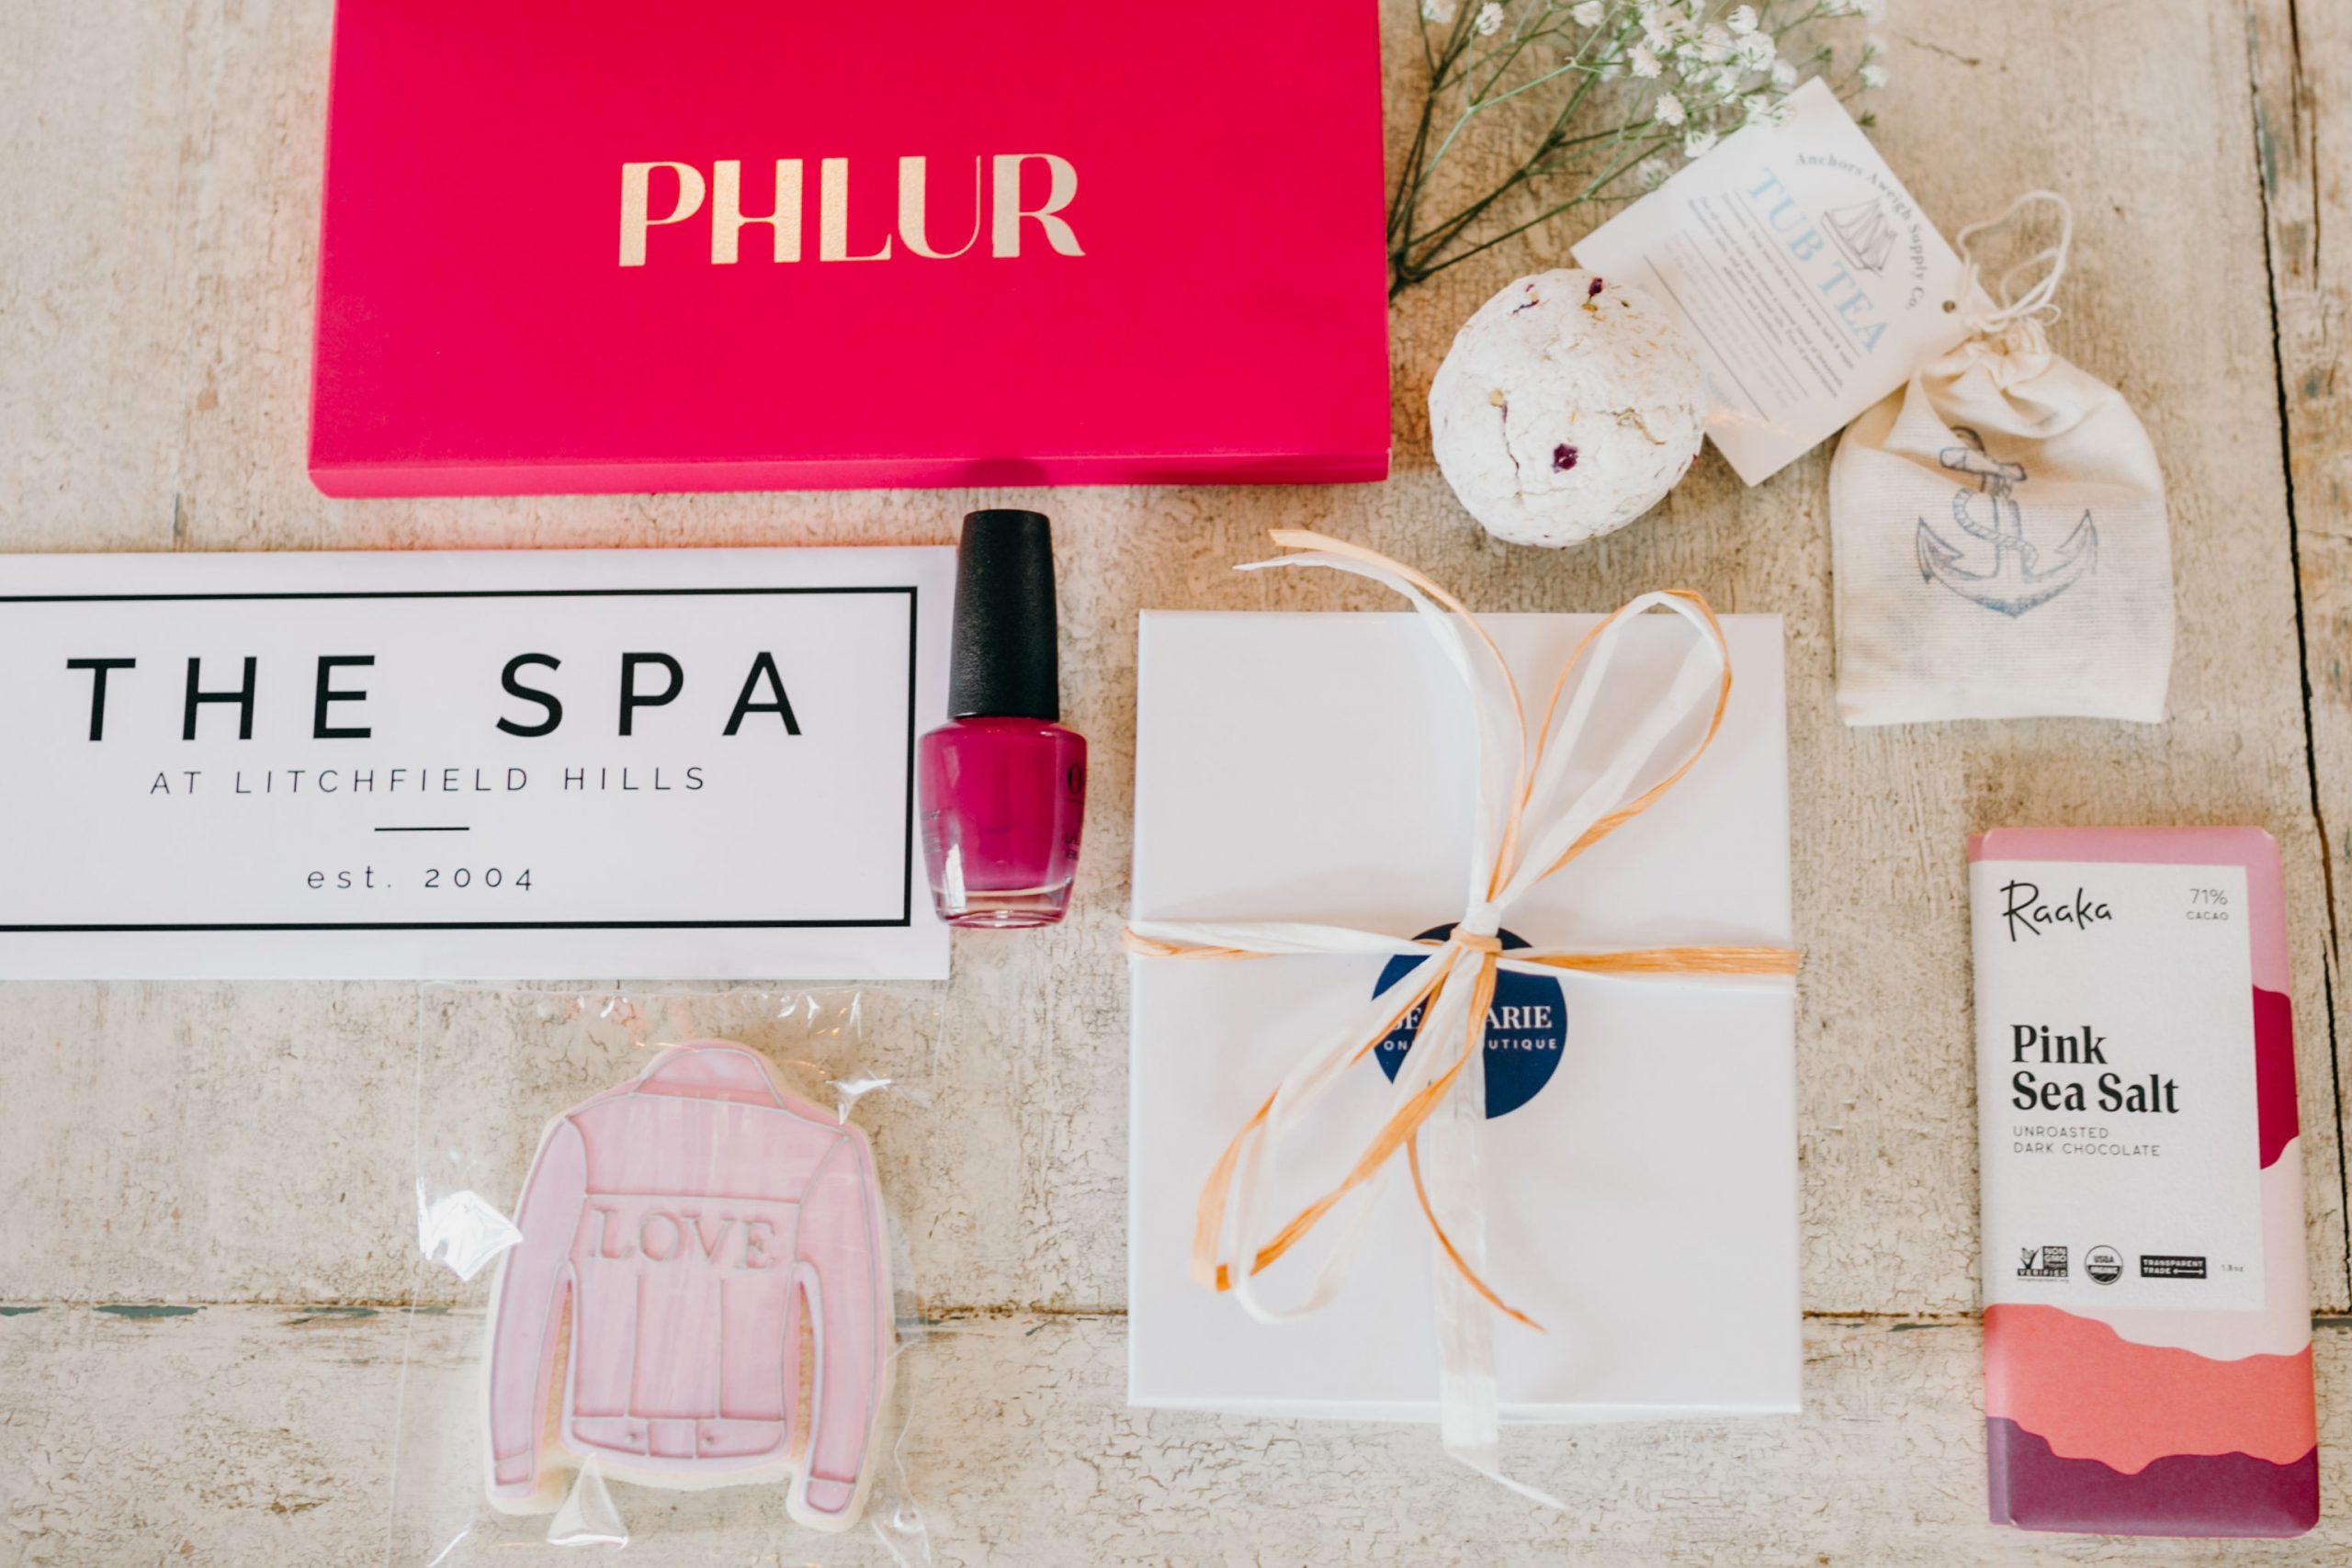 Phlur perfume, tub tea, homemade bath bomb, seamarie designs earrings, raaka chocolate, love jacket cookie, the spa at litchfield hills